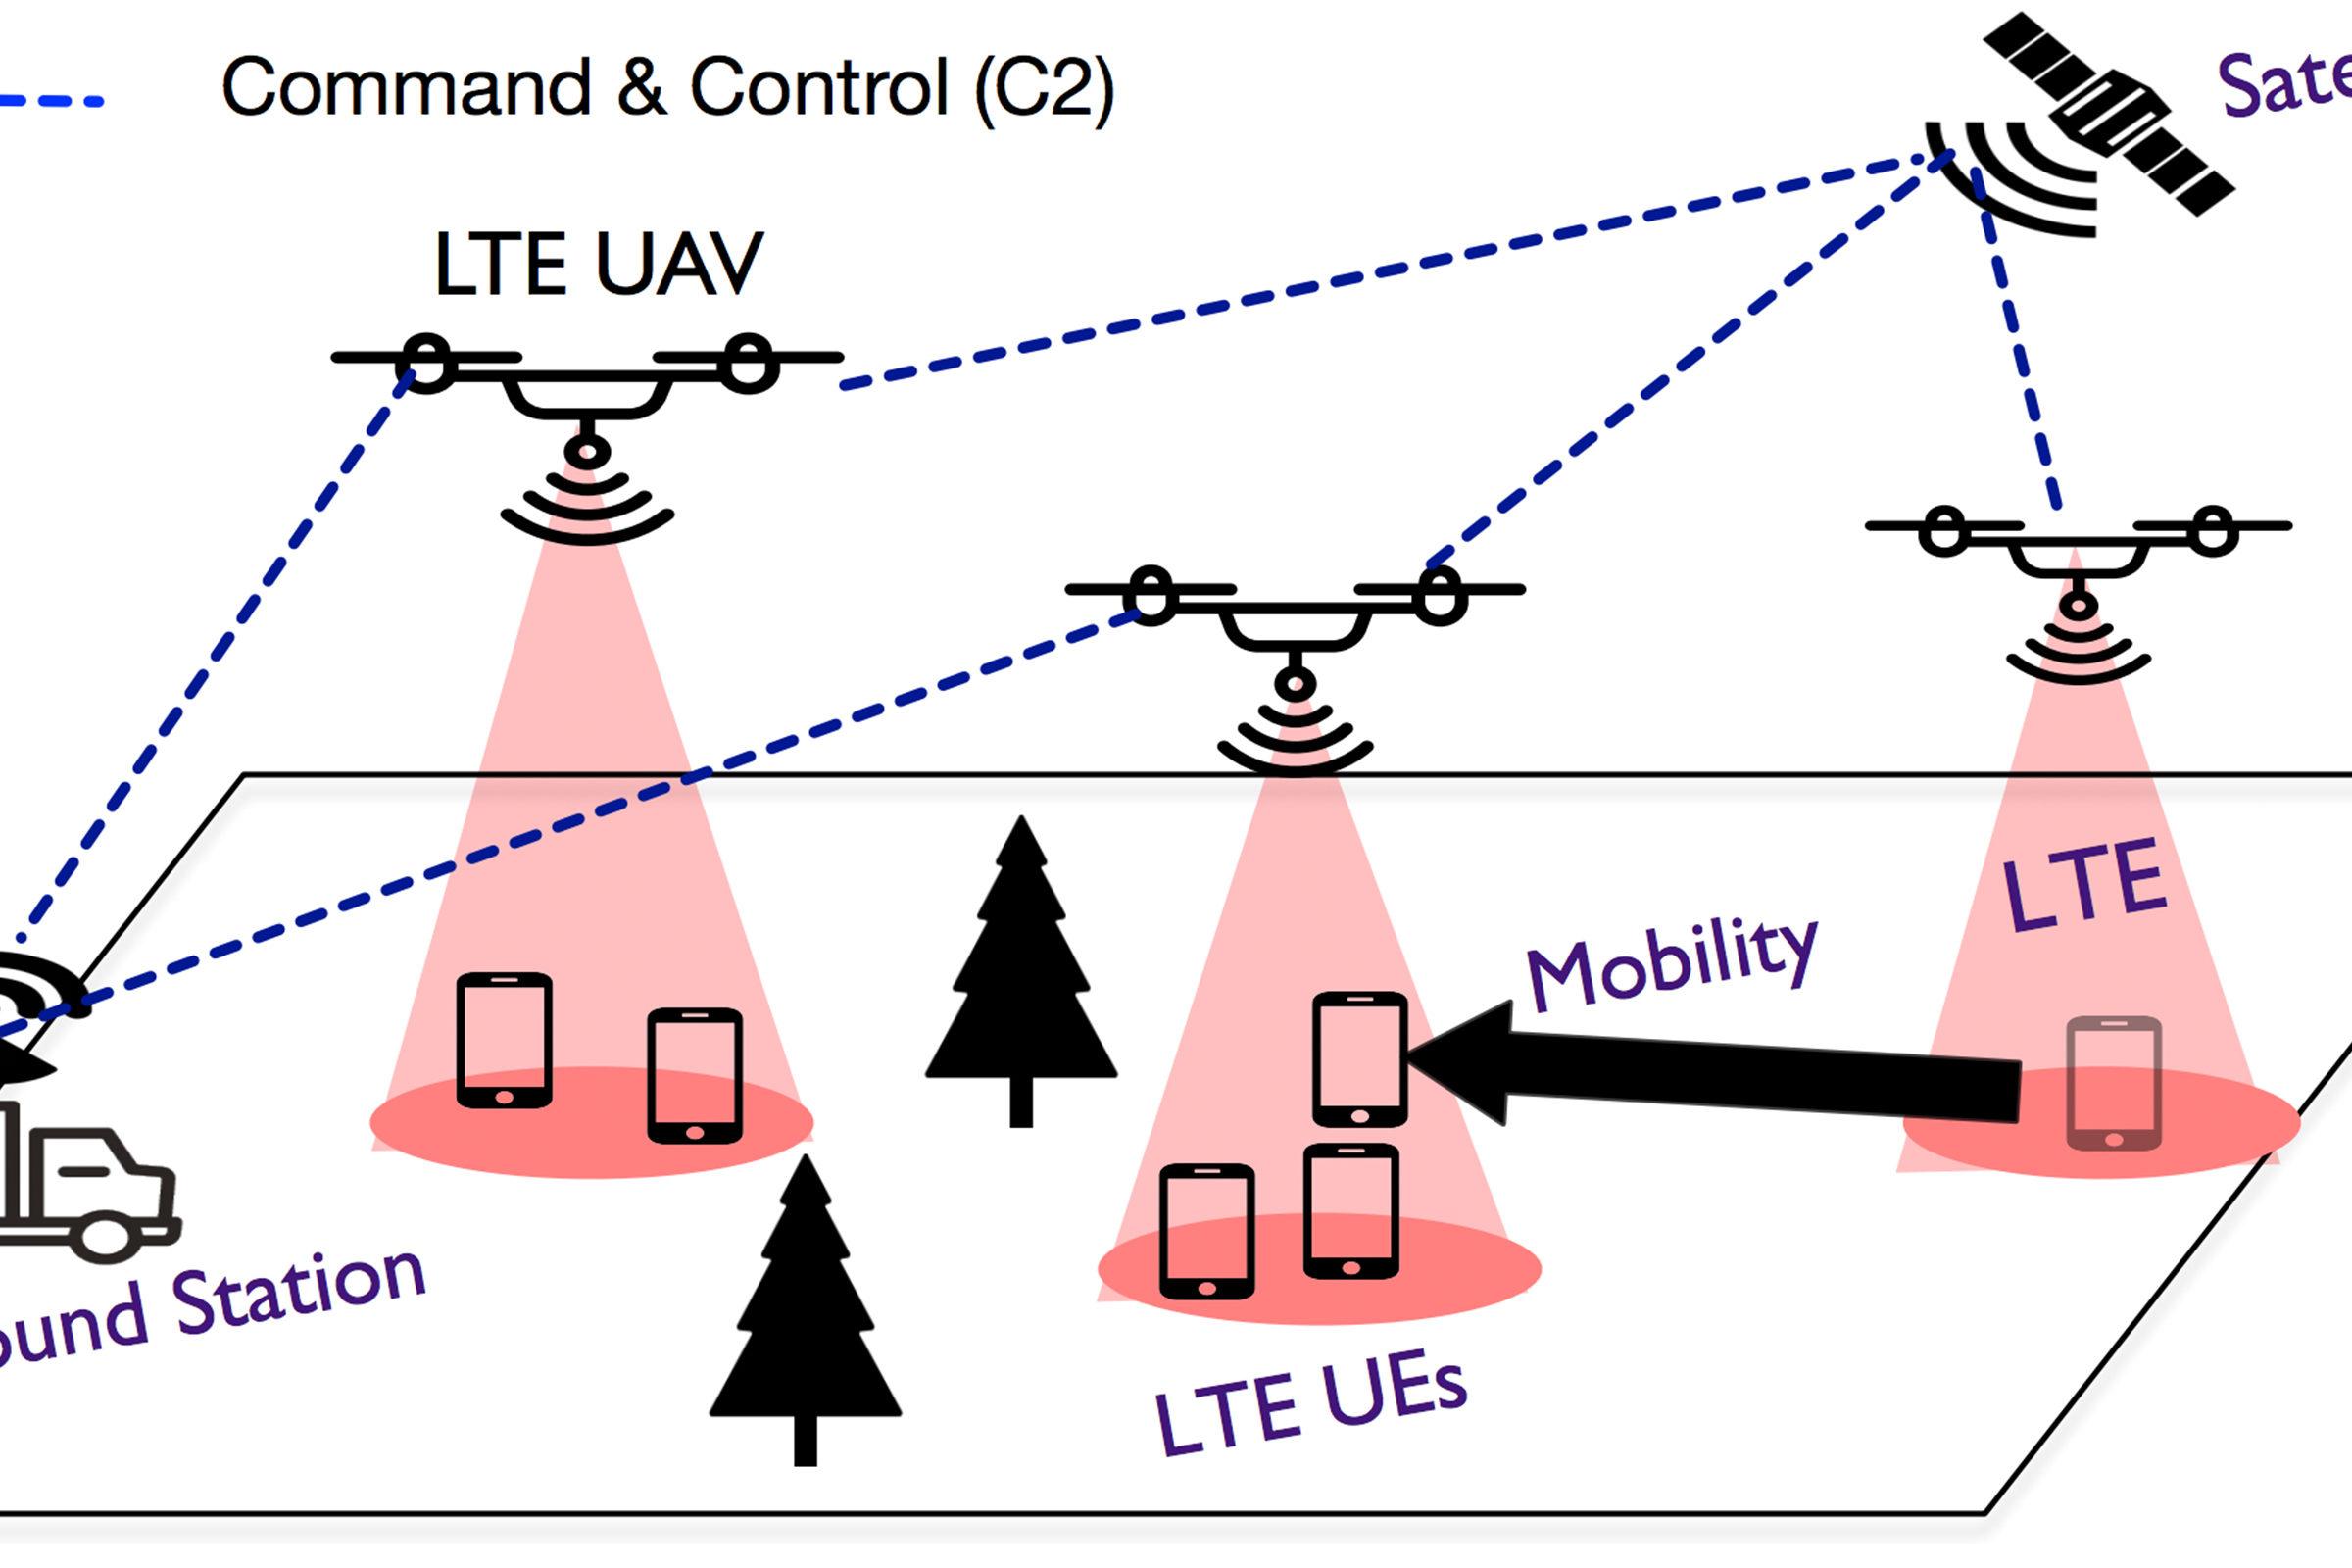 Drone diagram